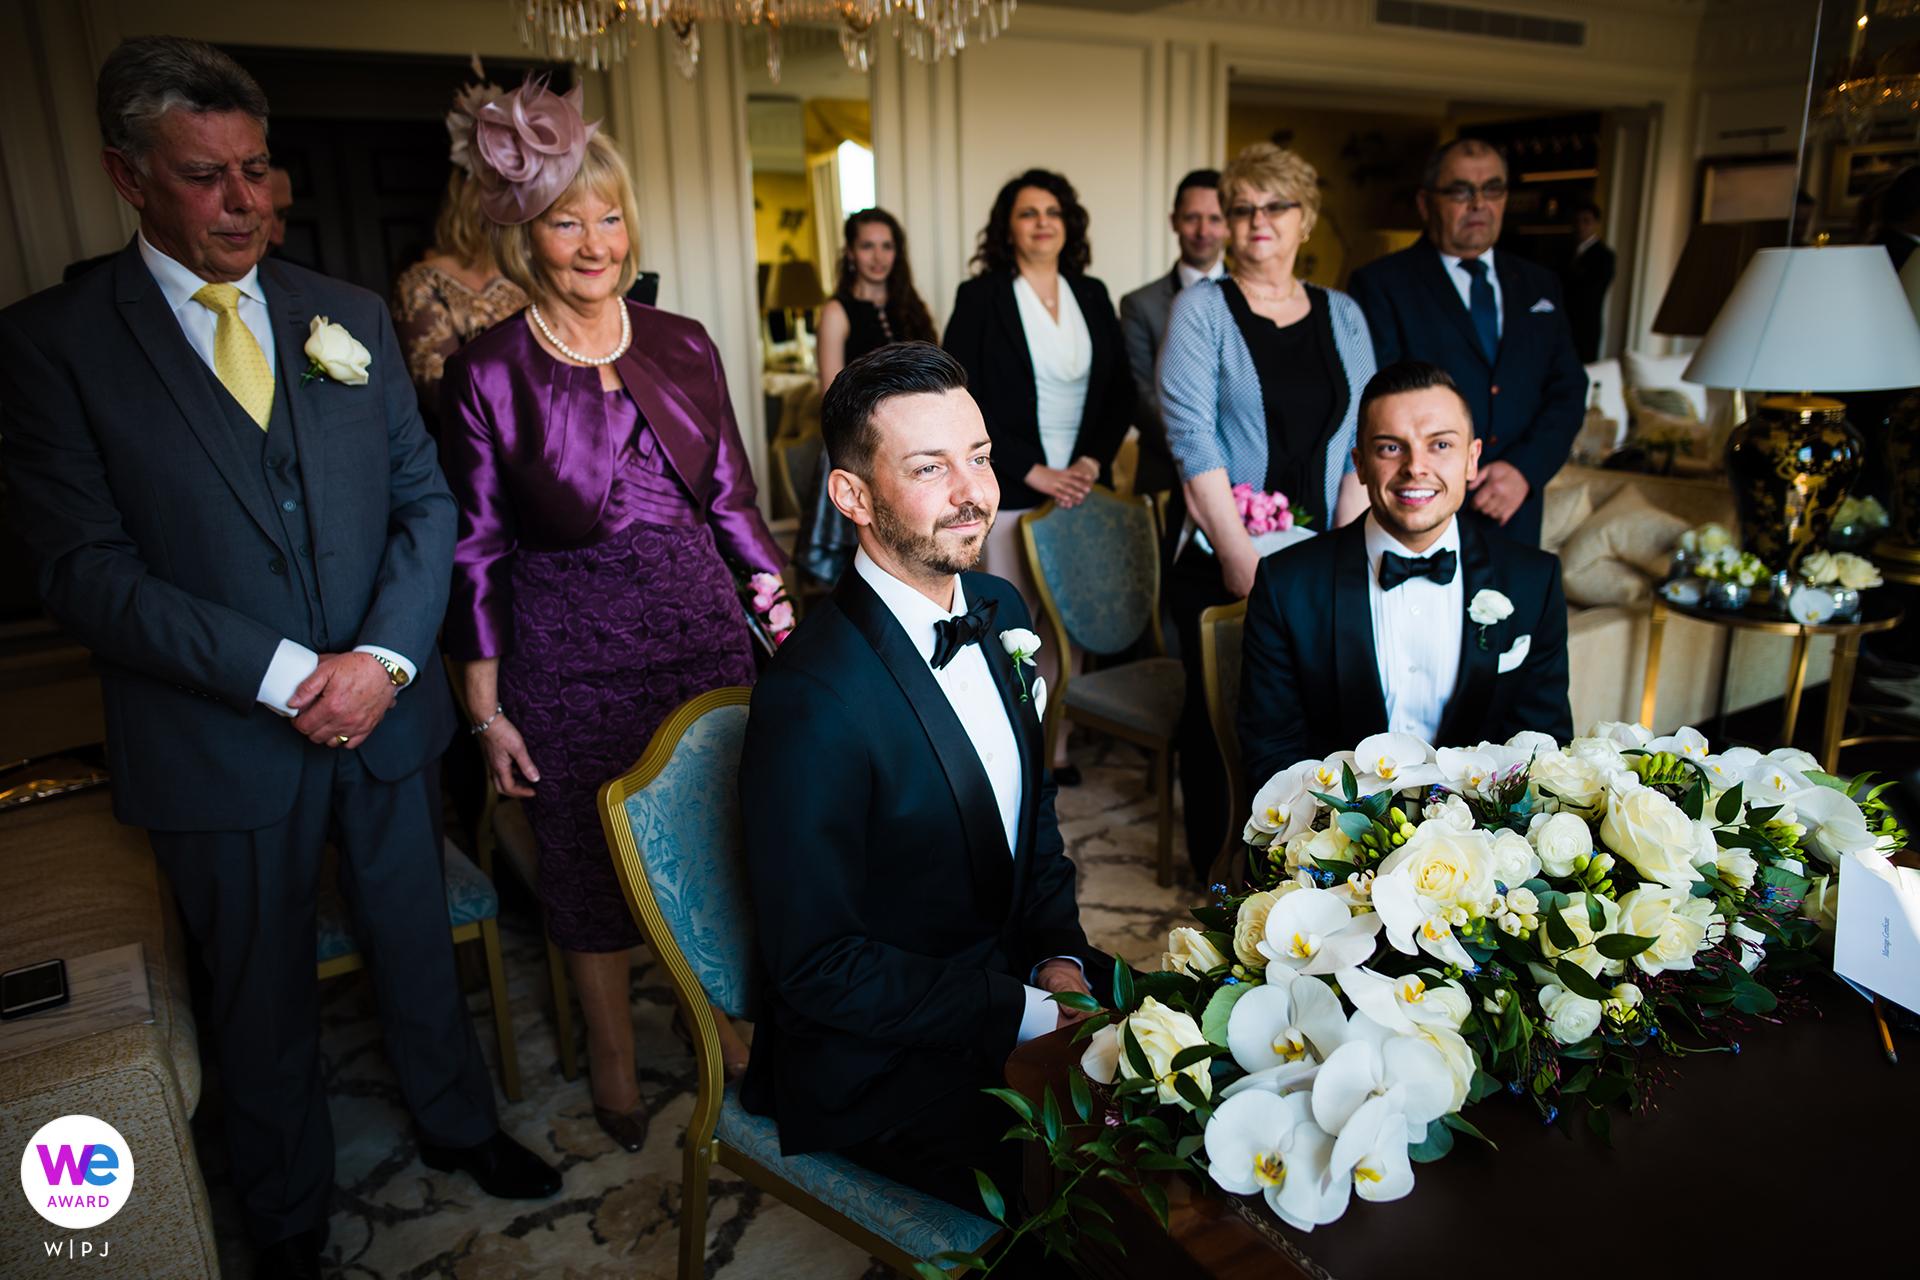 The Savoy Hotel London Elopement Photographer | Close family enjoy the wedding ceremony